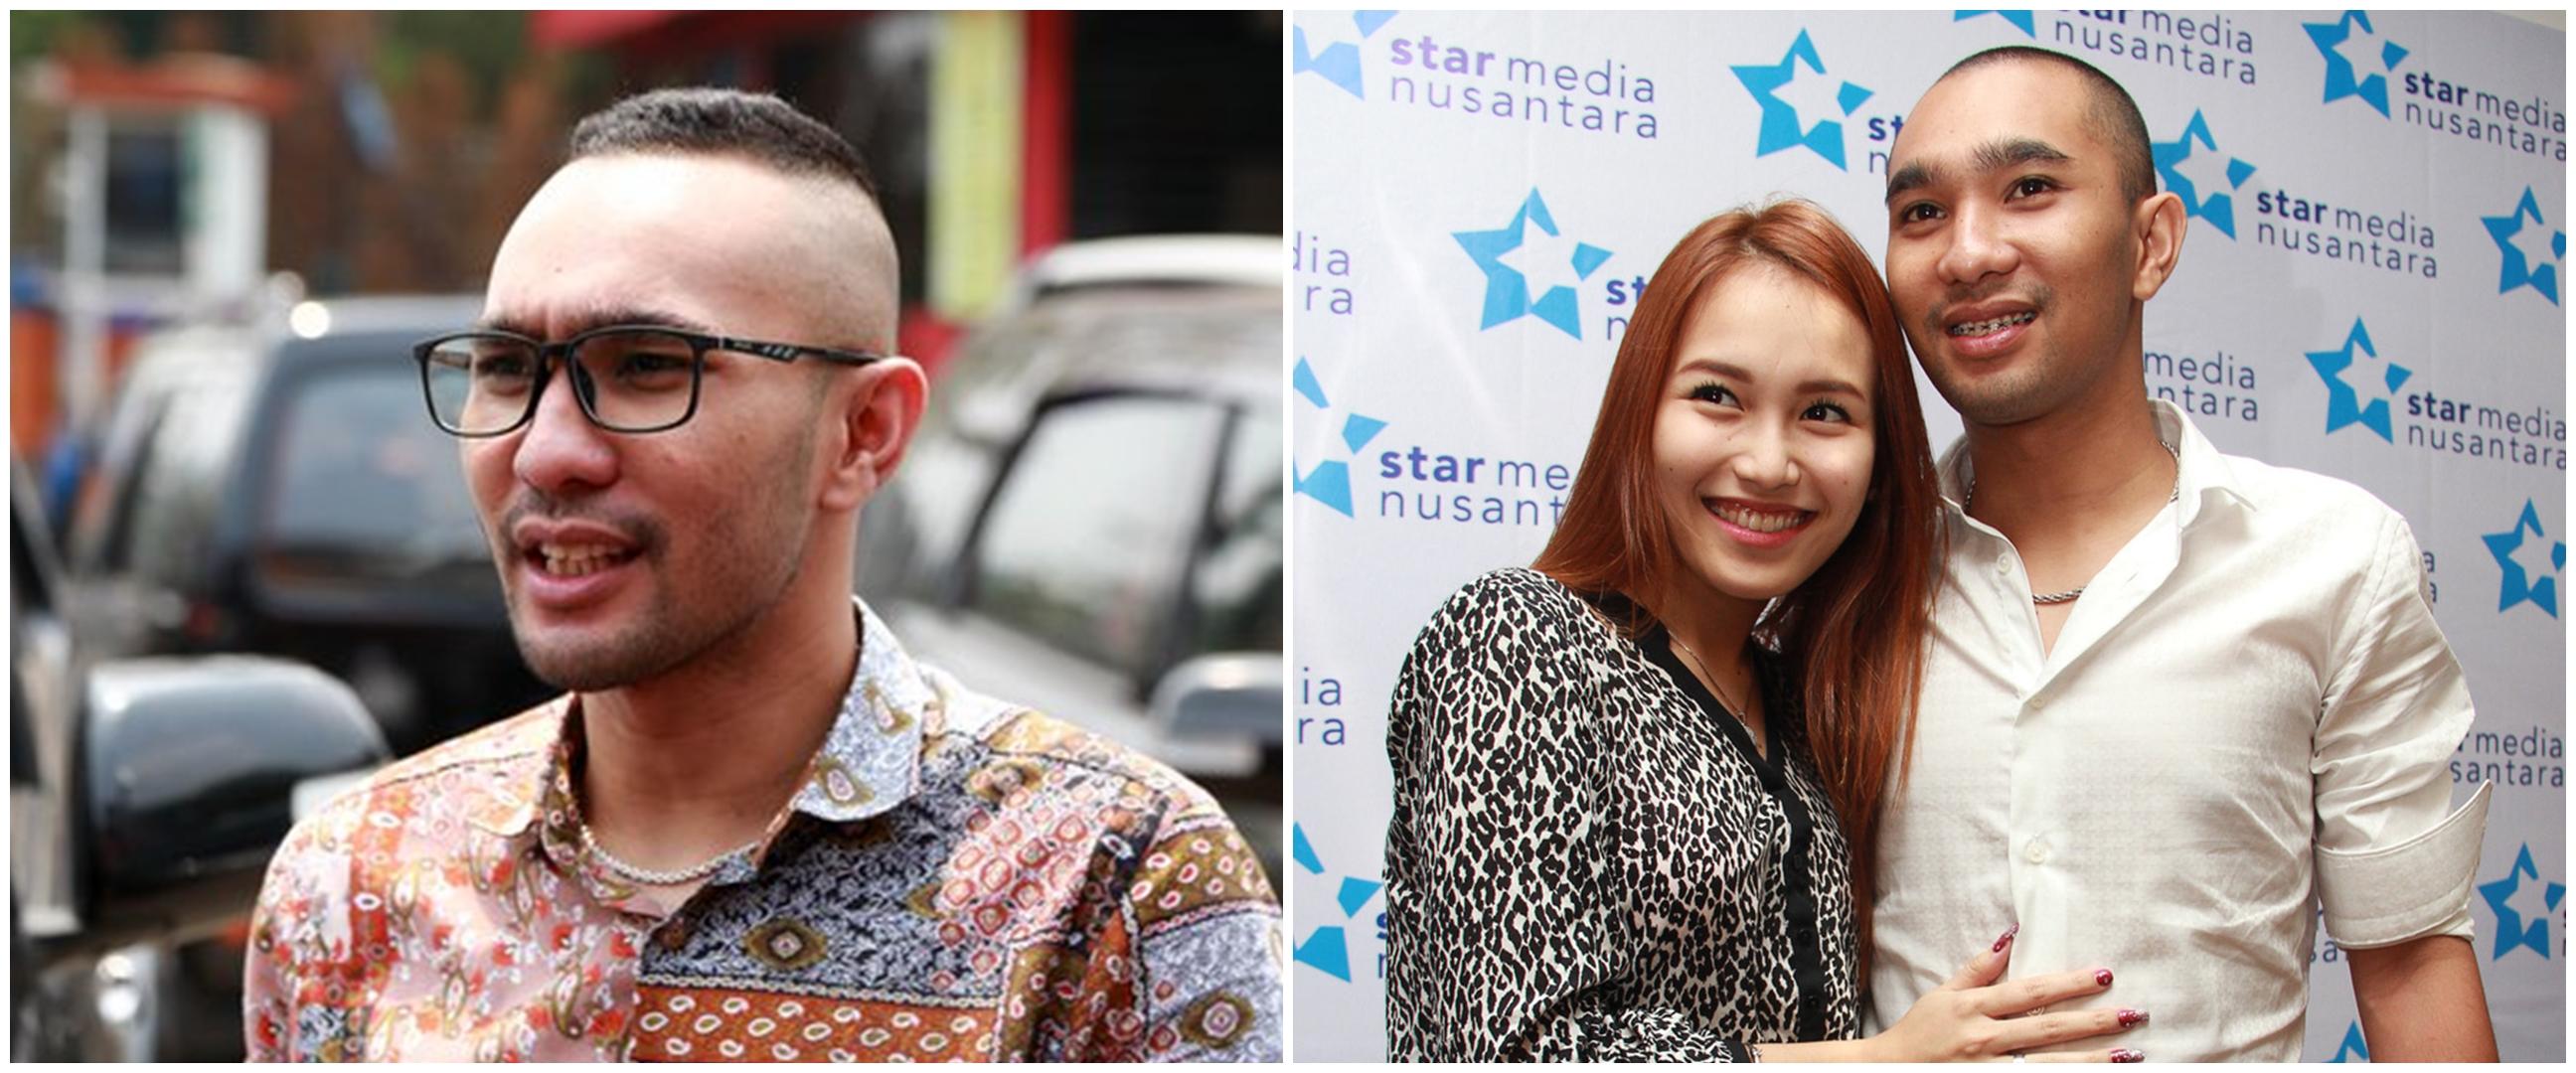 Momen mesra pernikahan ketiga Enji mantan suami Ayu Ting Ting